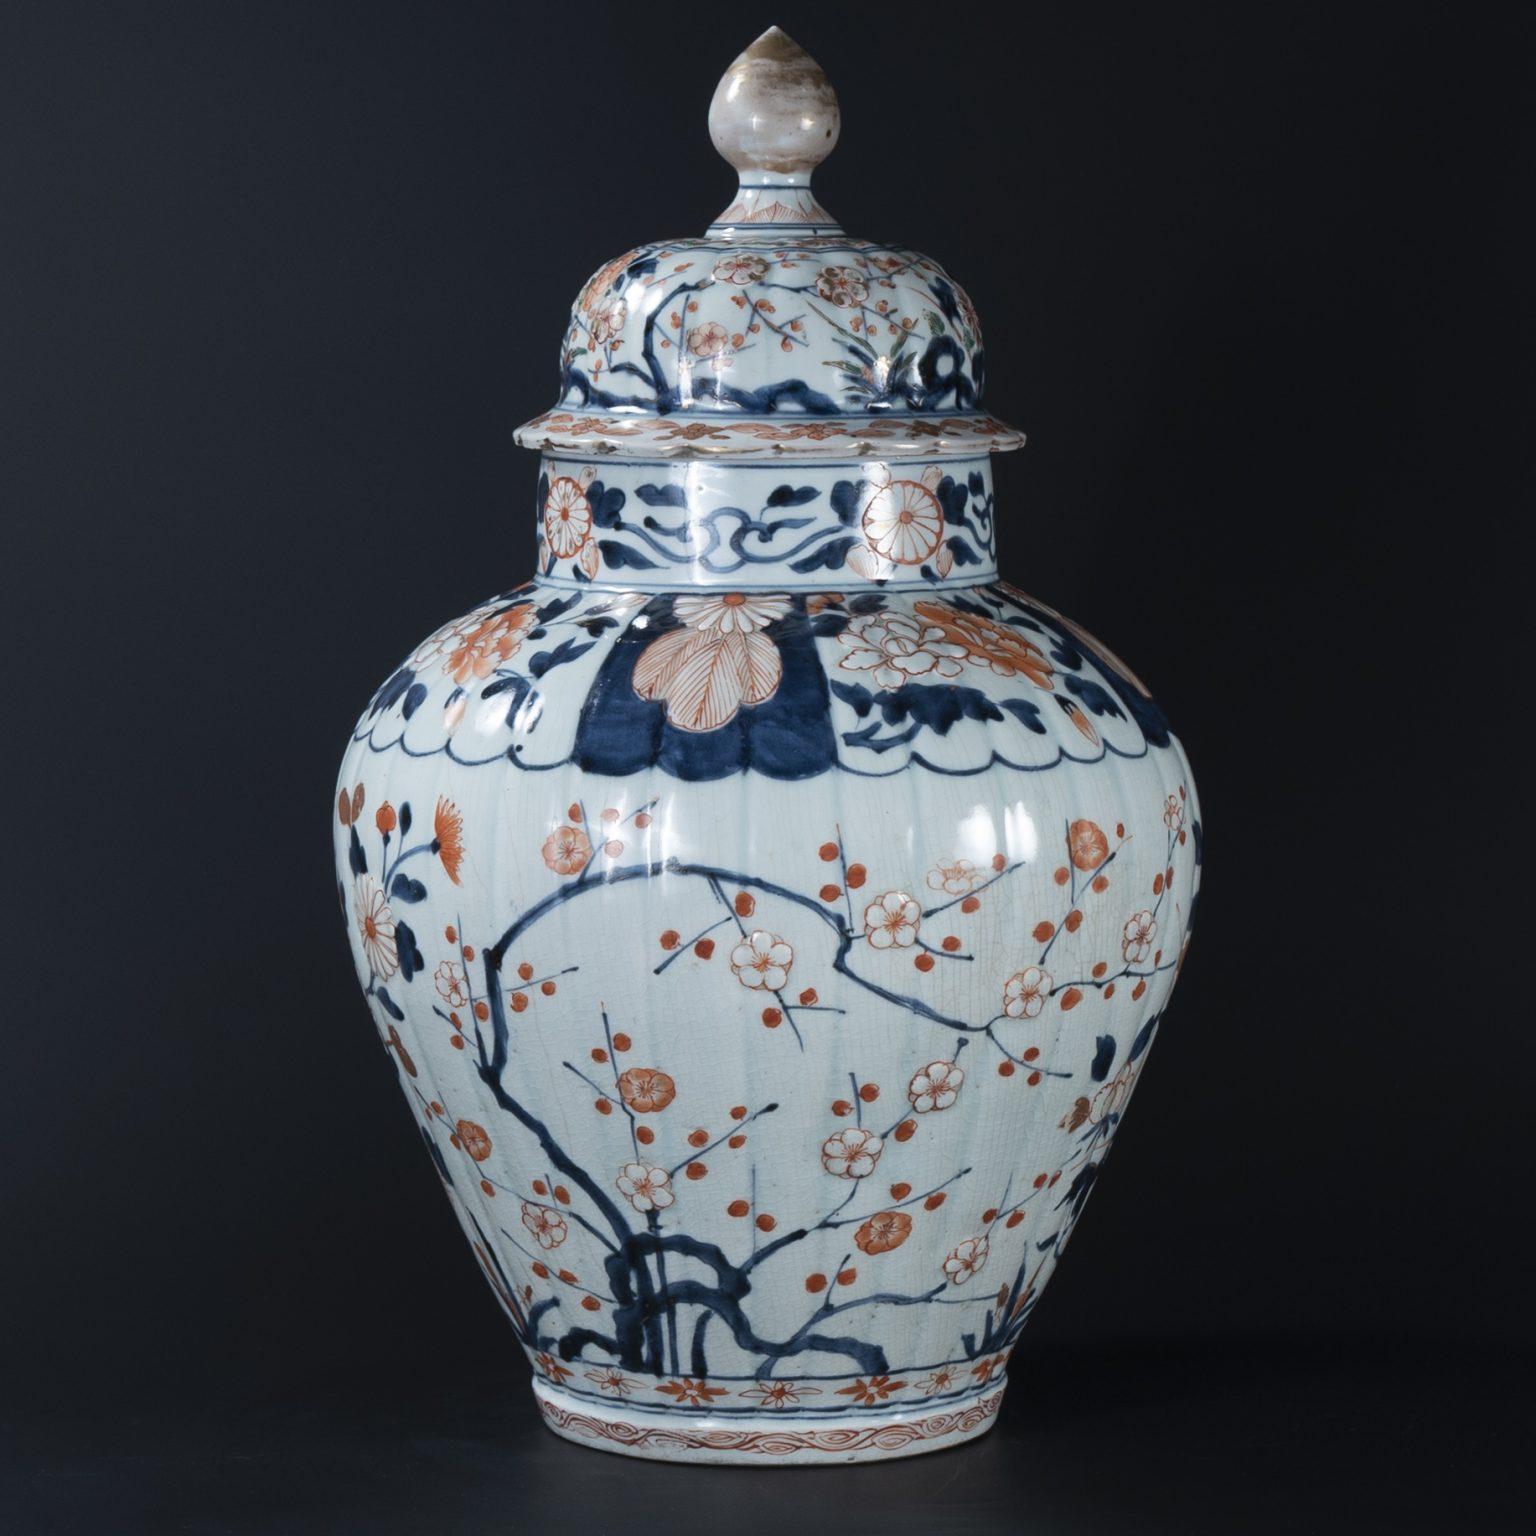 17th Century Japanese Imari Porcelain Vase and Lid